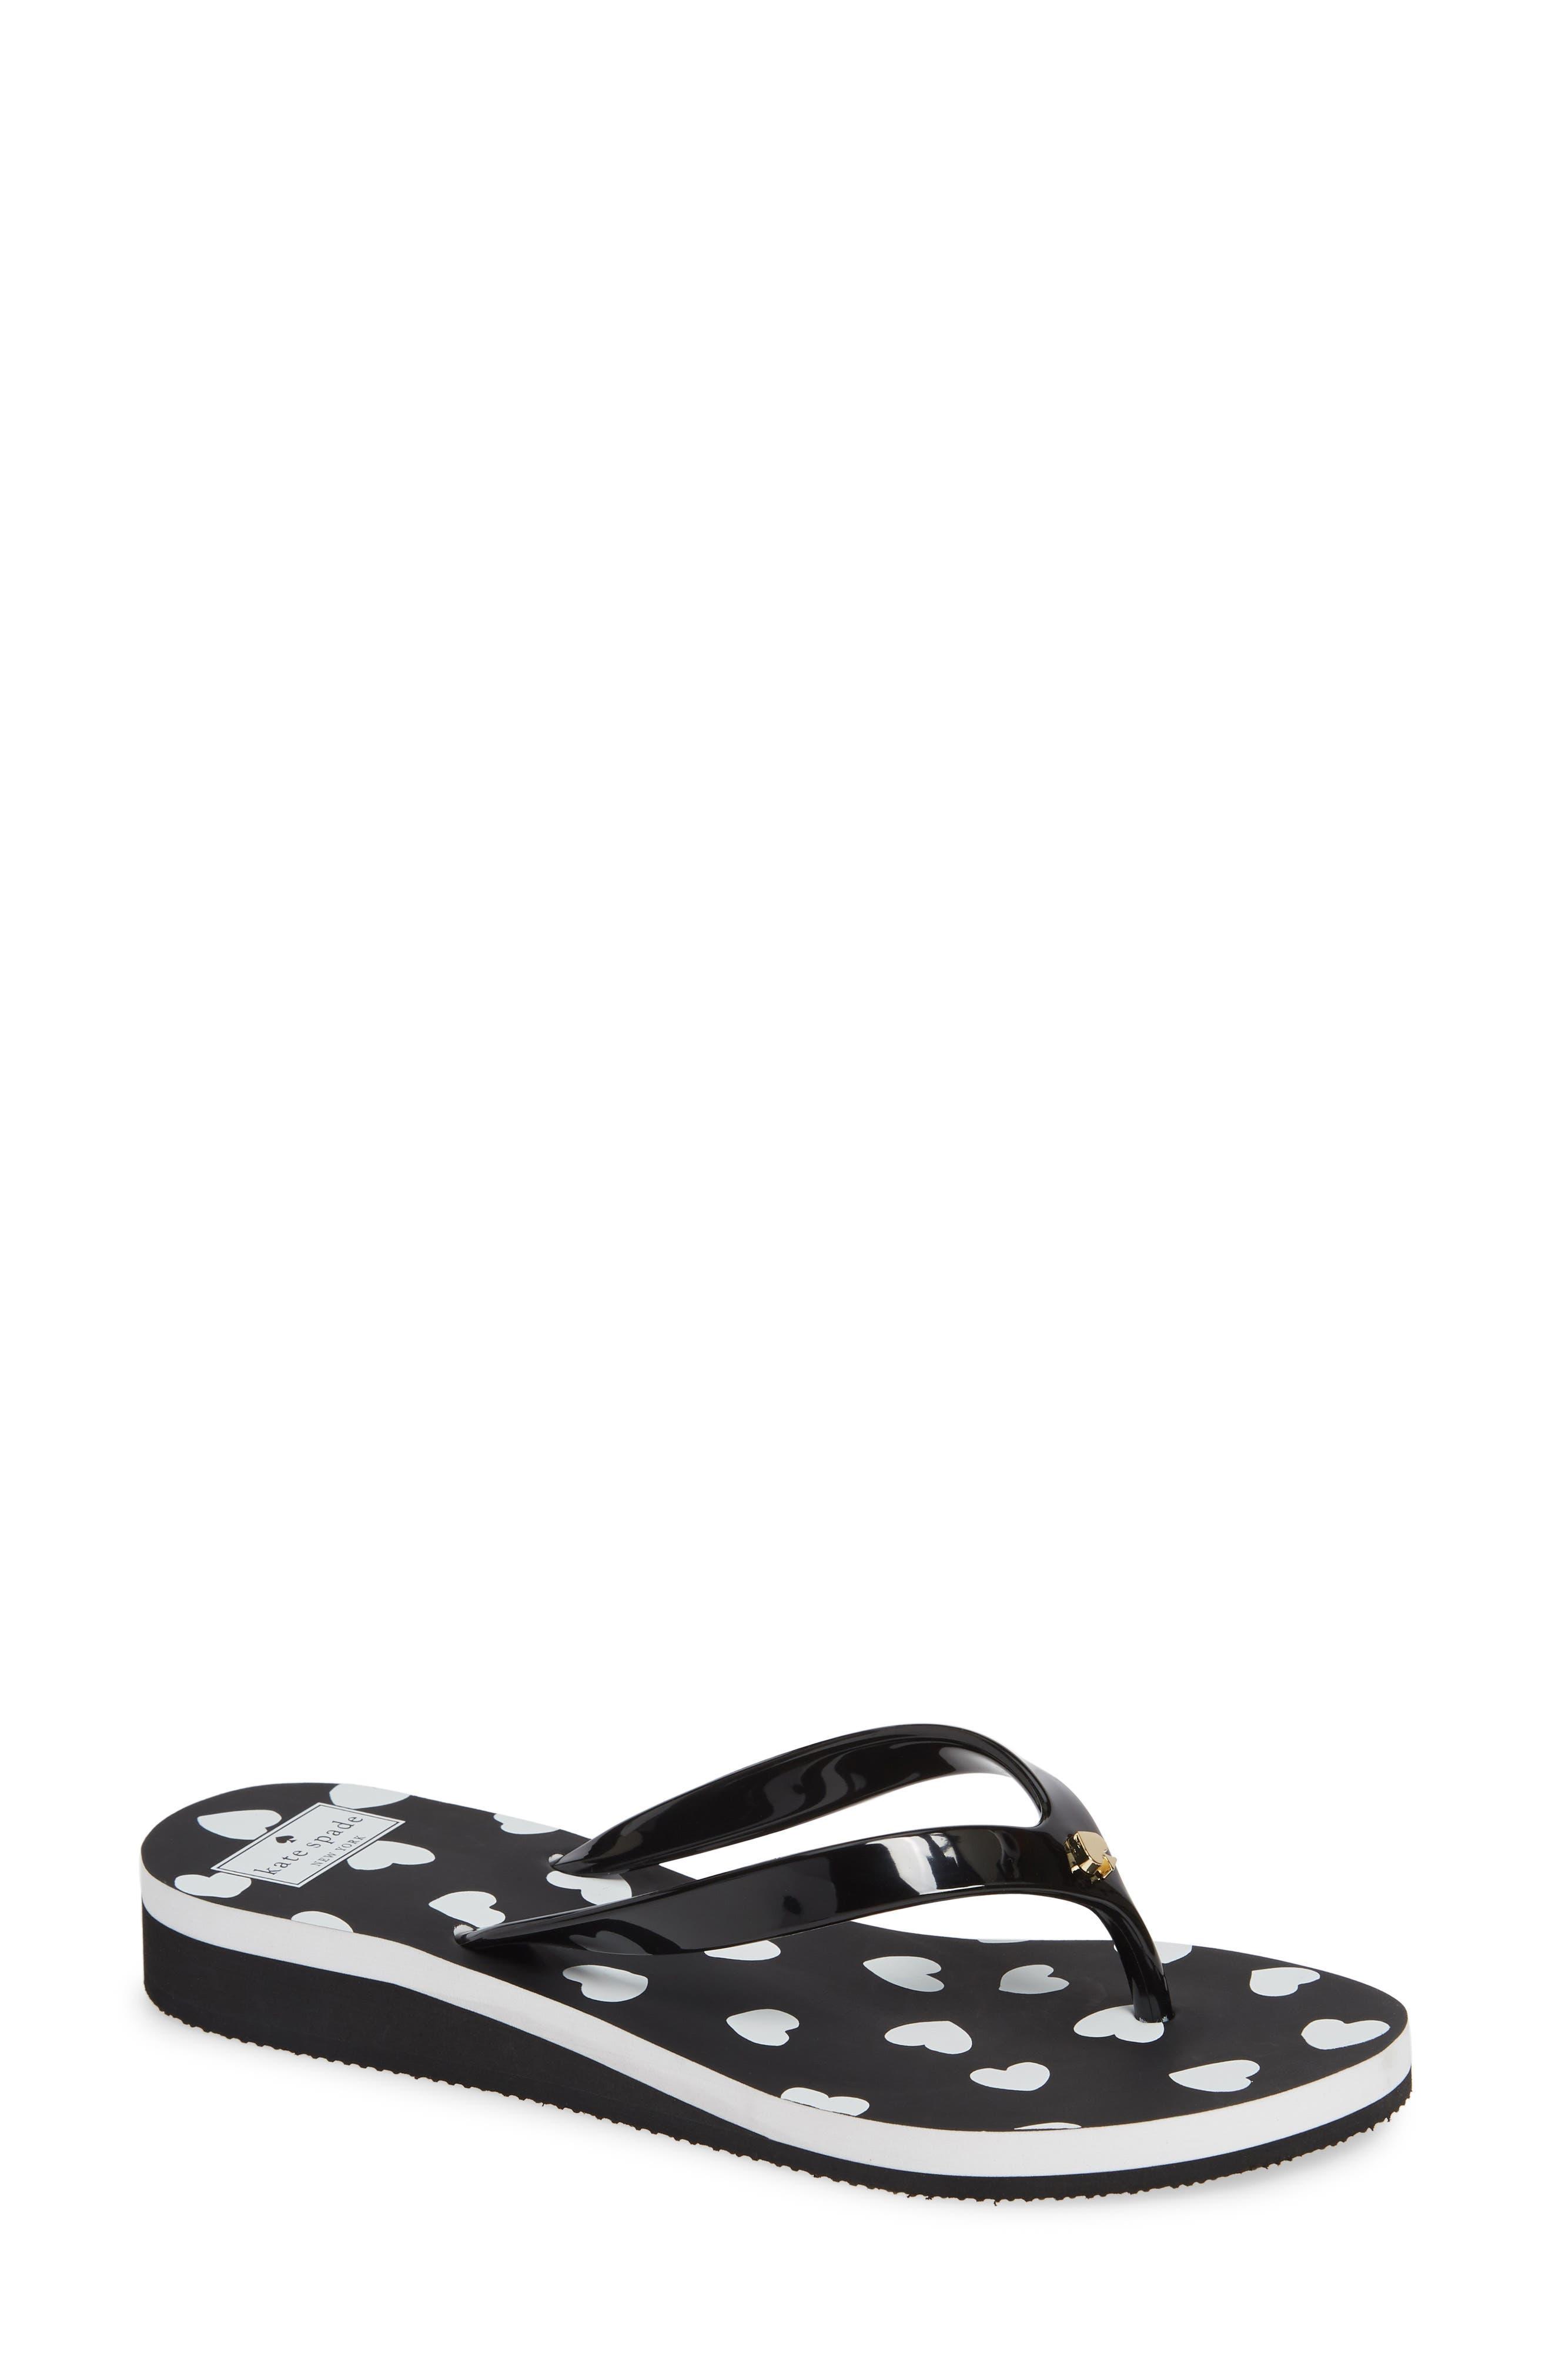 KATE SPADE NEW YORK, milli wedge flip-flop, Main thumbnail 1, color, BLACK/ WHITE HEART